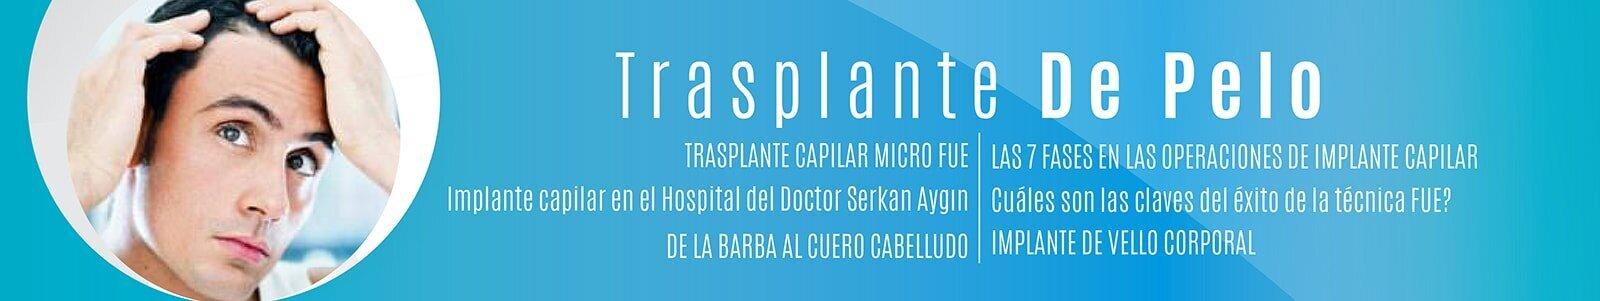 Trasplante De Pelo-01